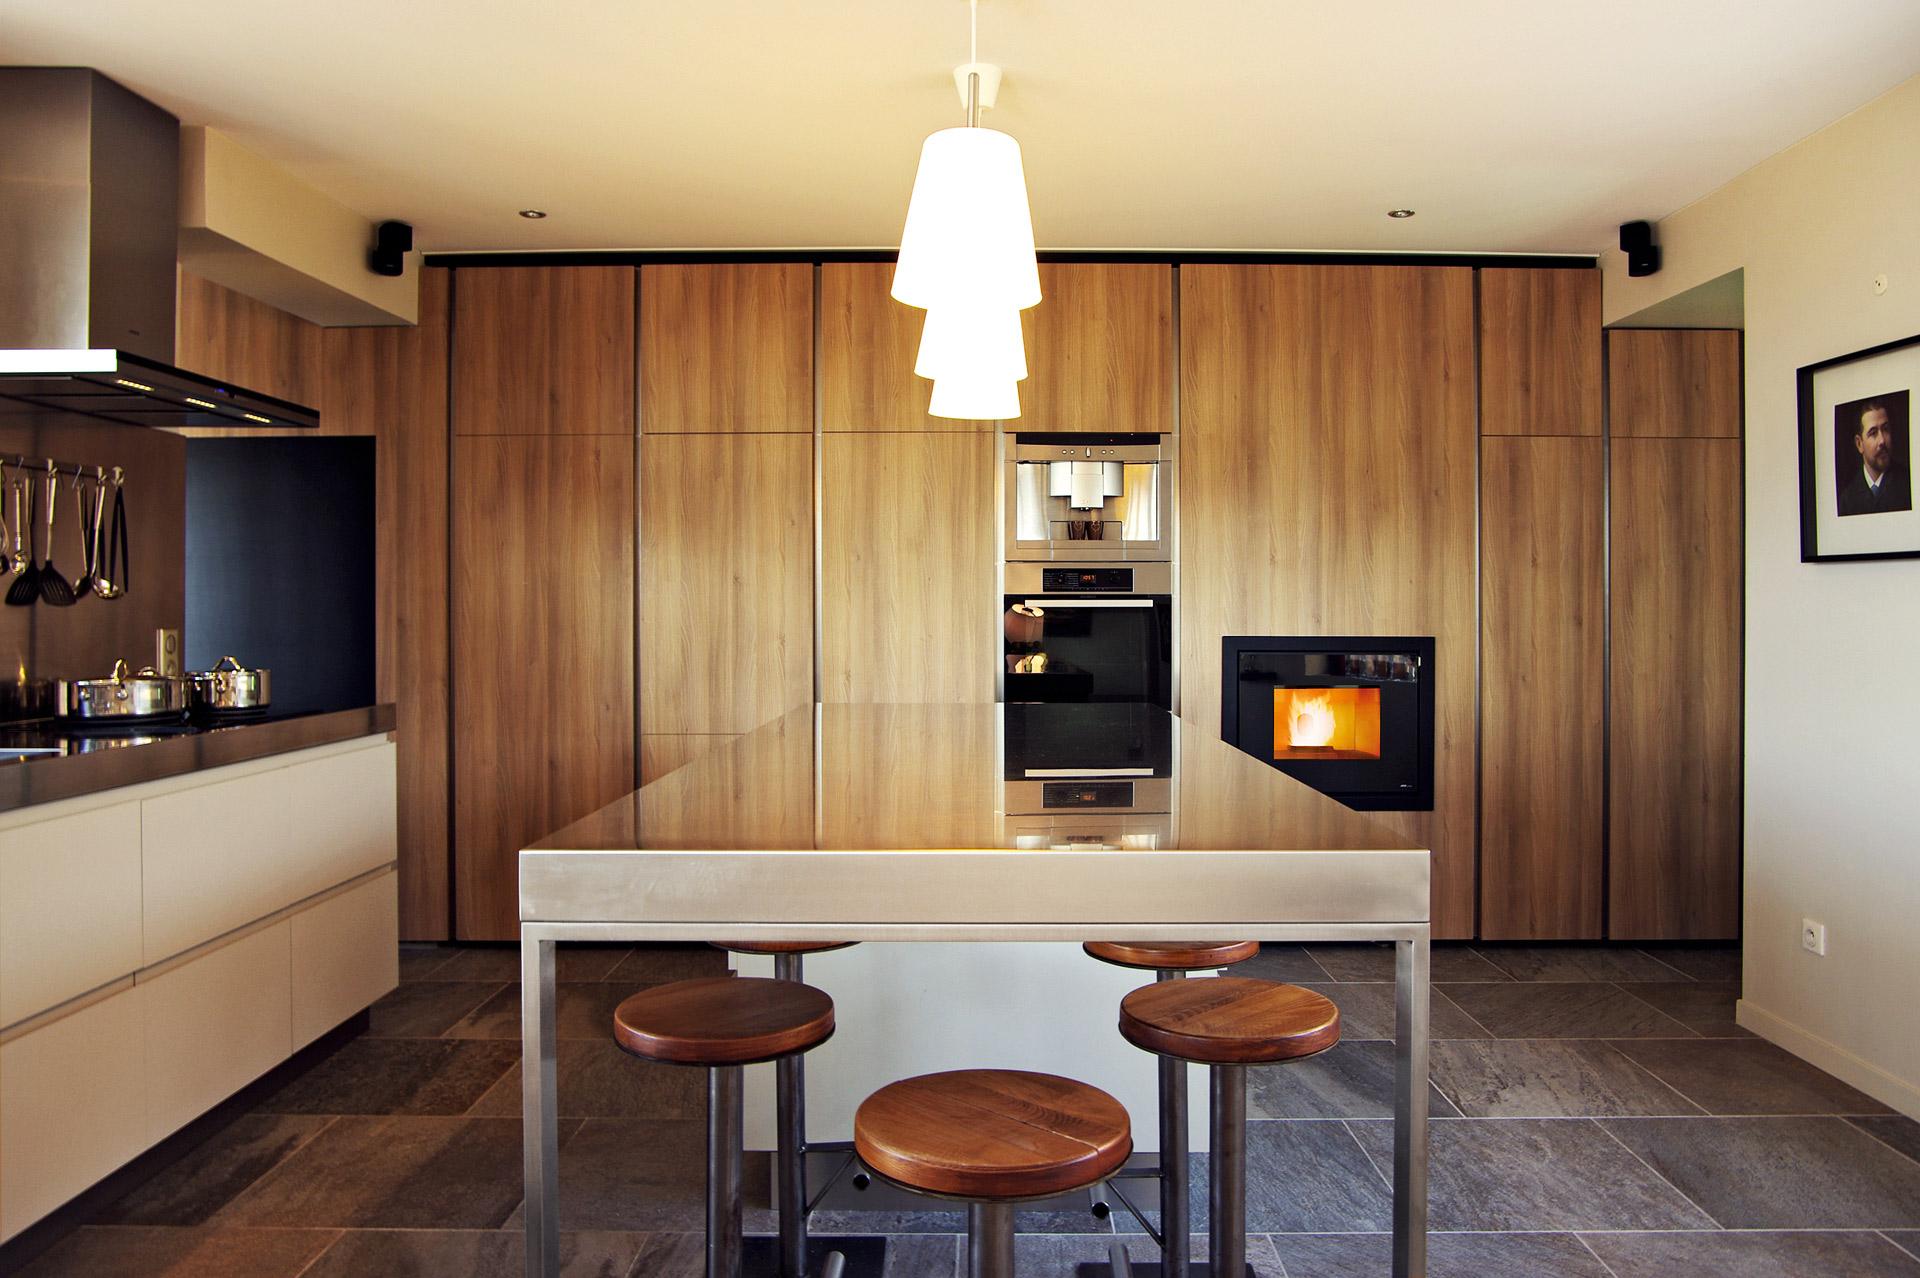 cheminee-a-granule-dans-la-cuisine